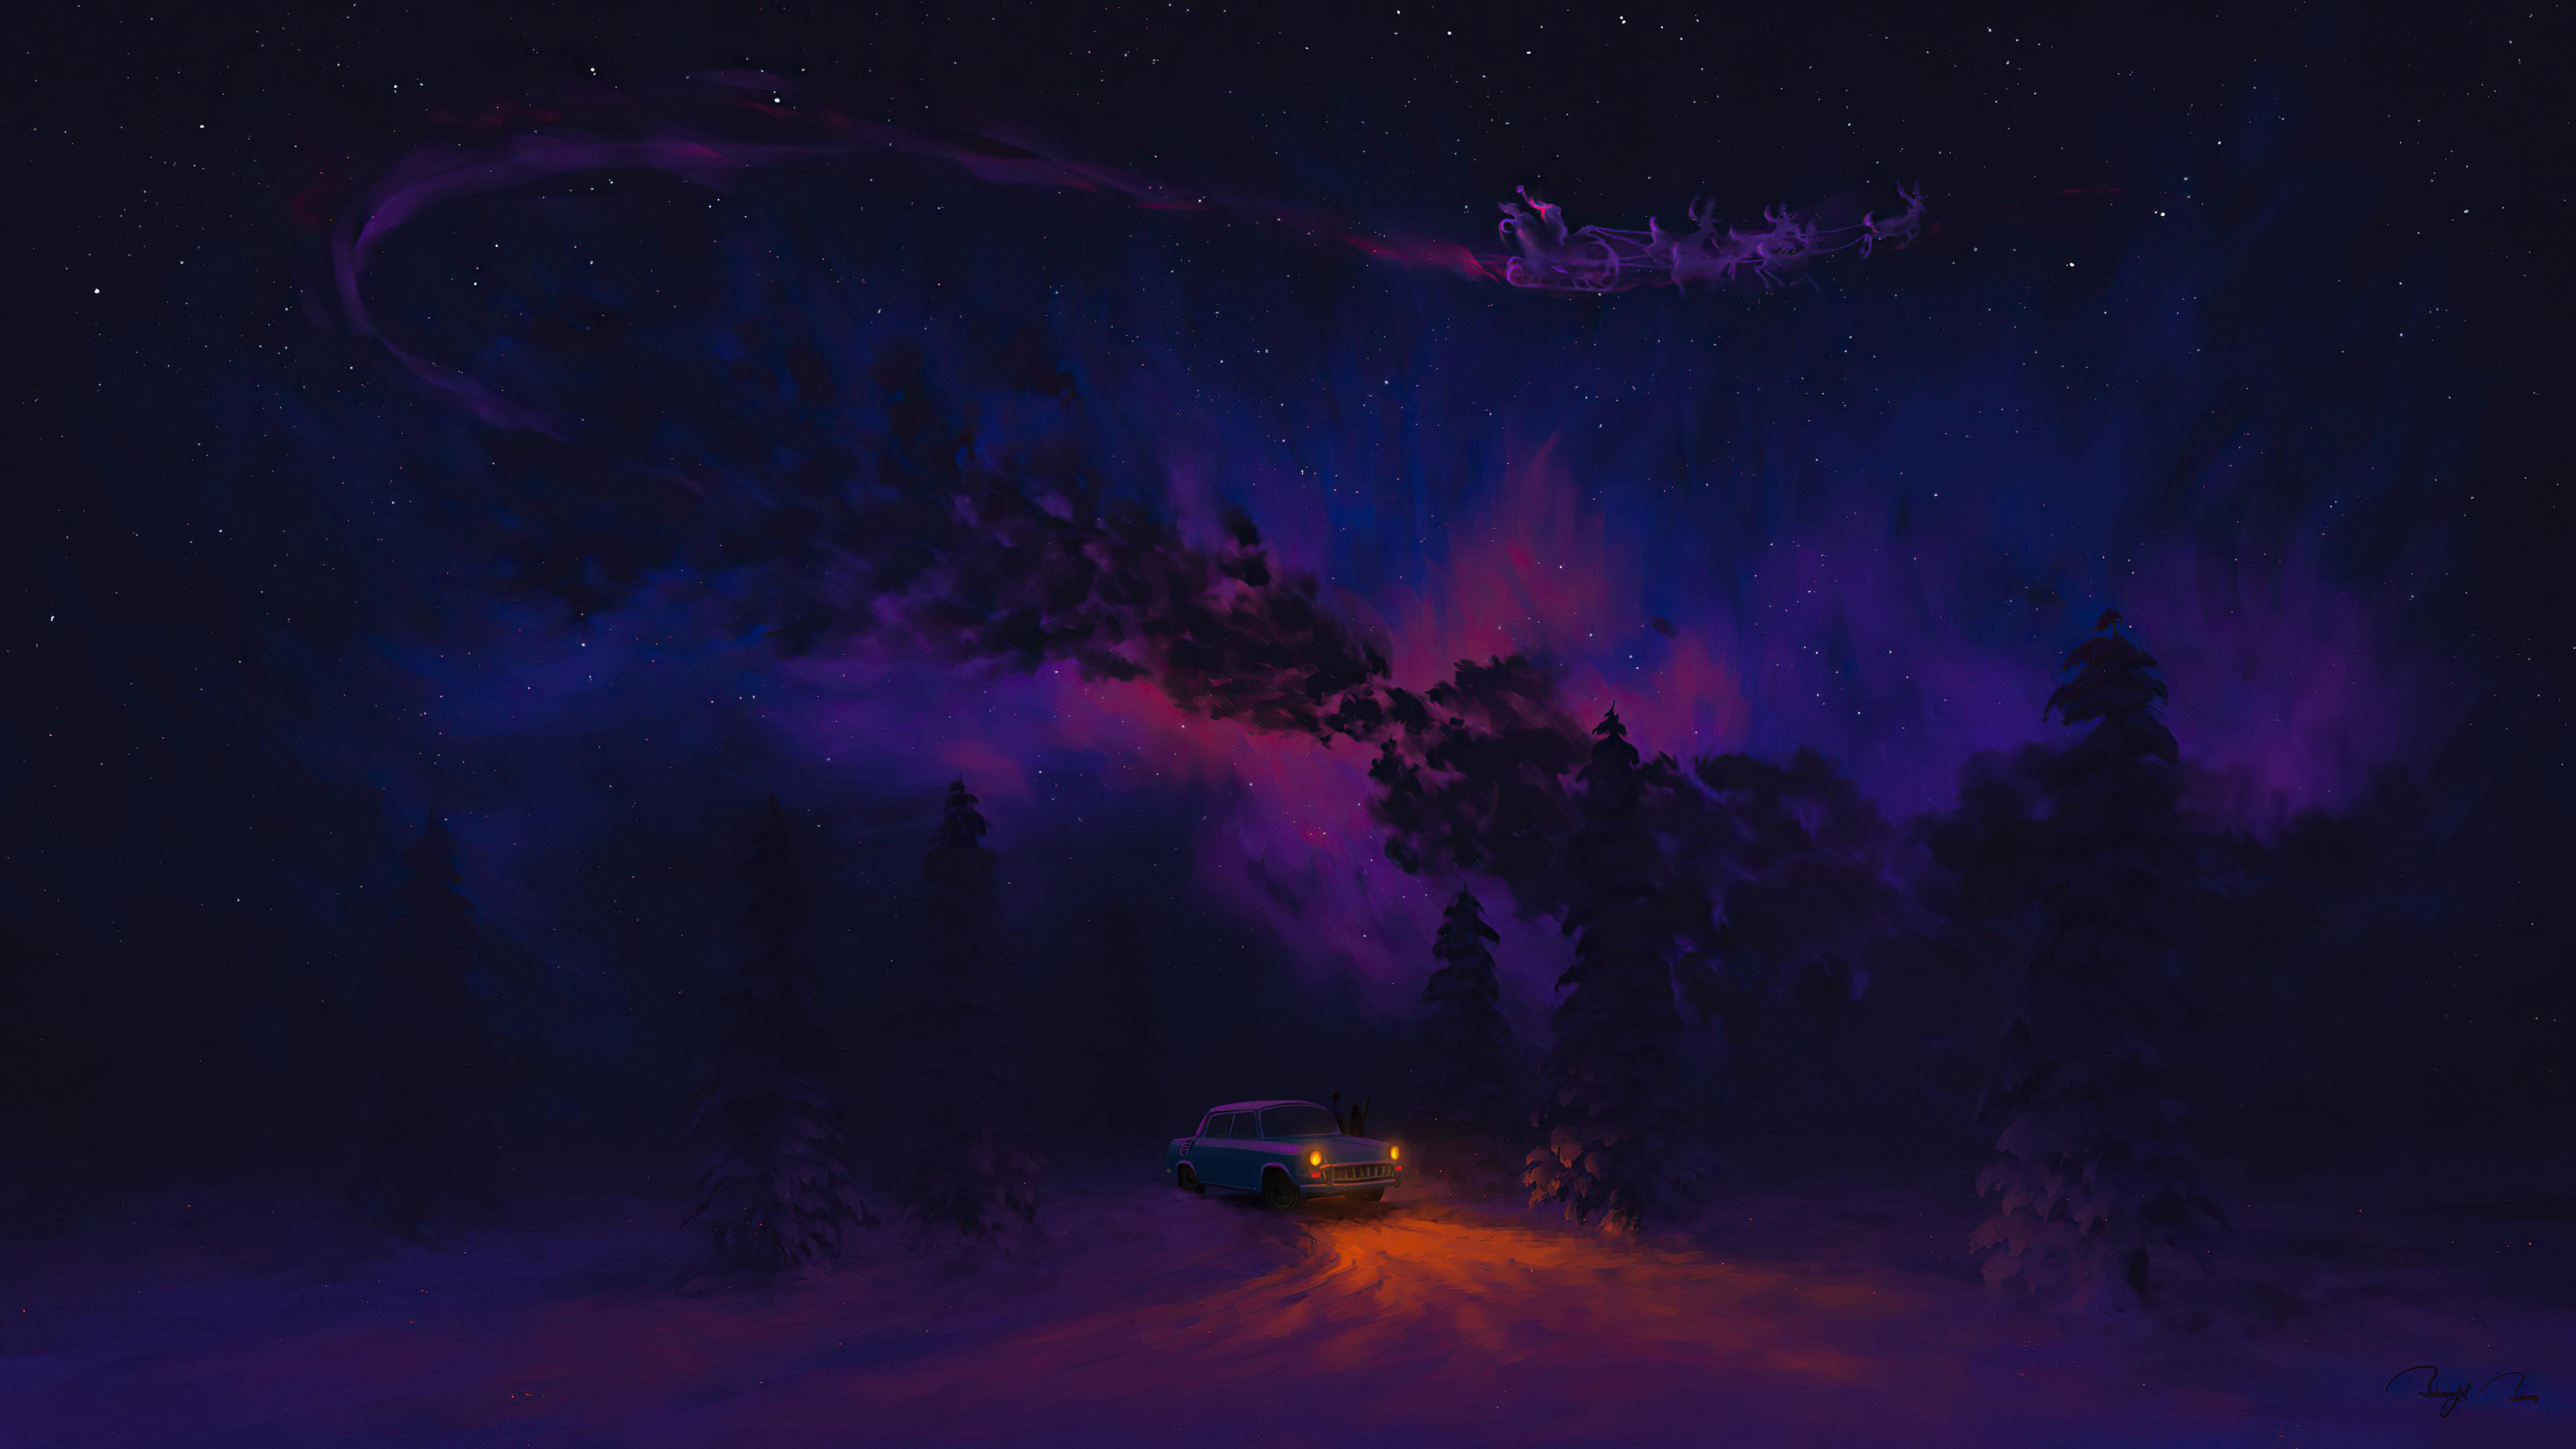 late-for-christmas-night-4k-n3.jpg